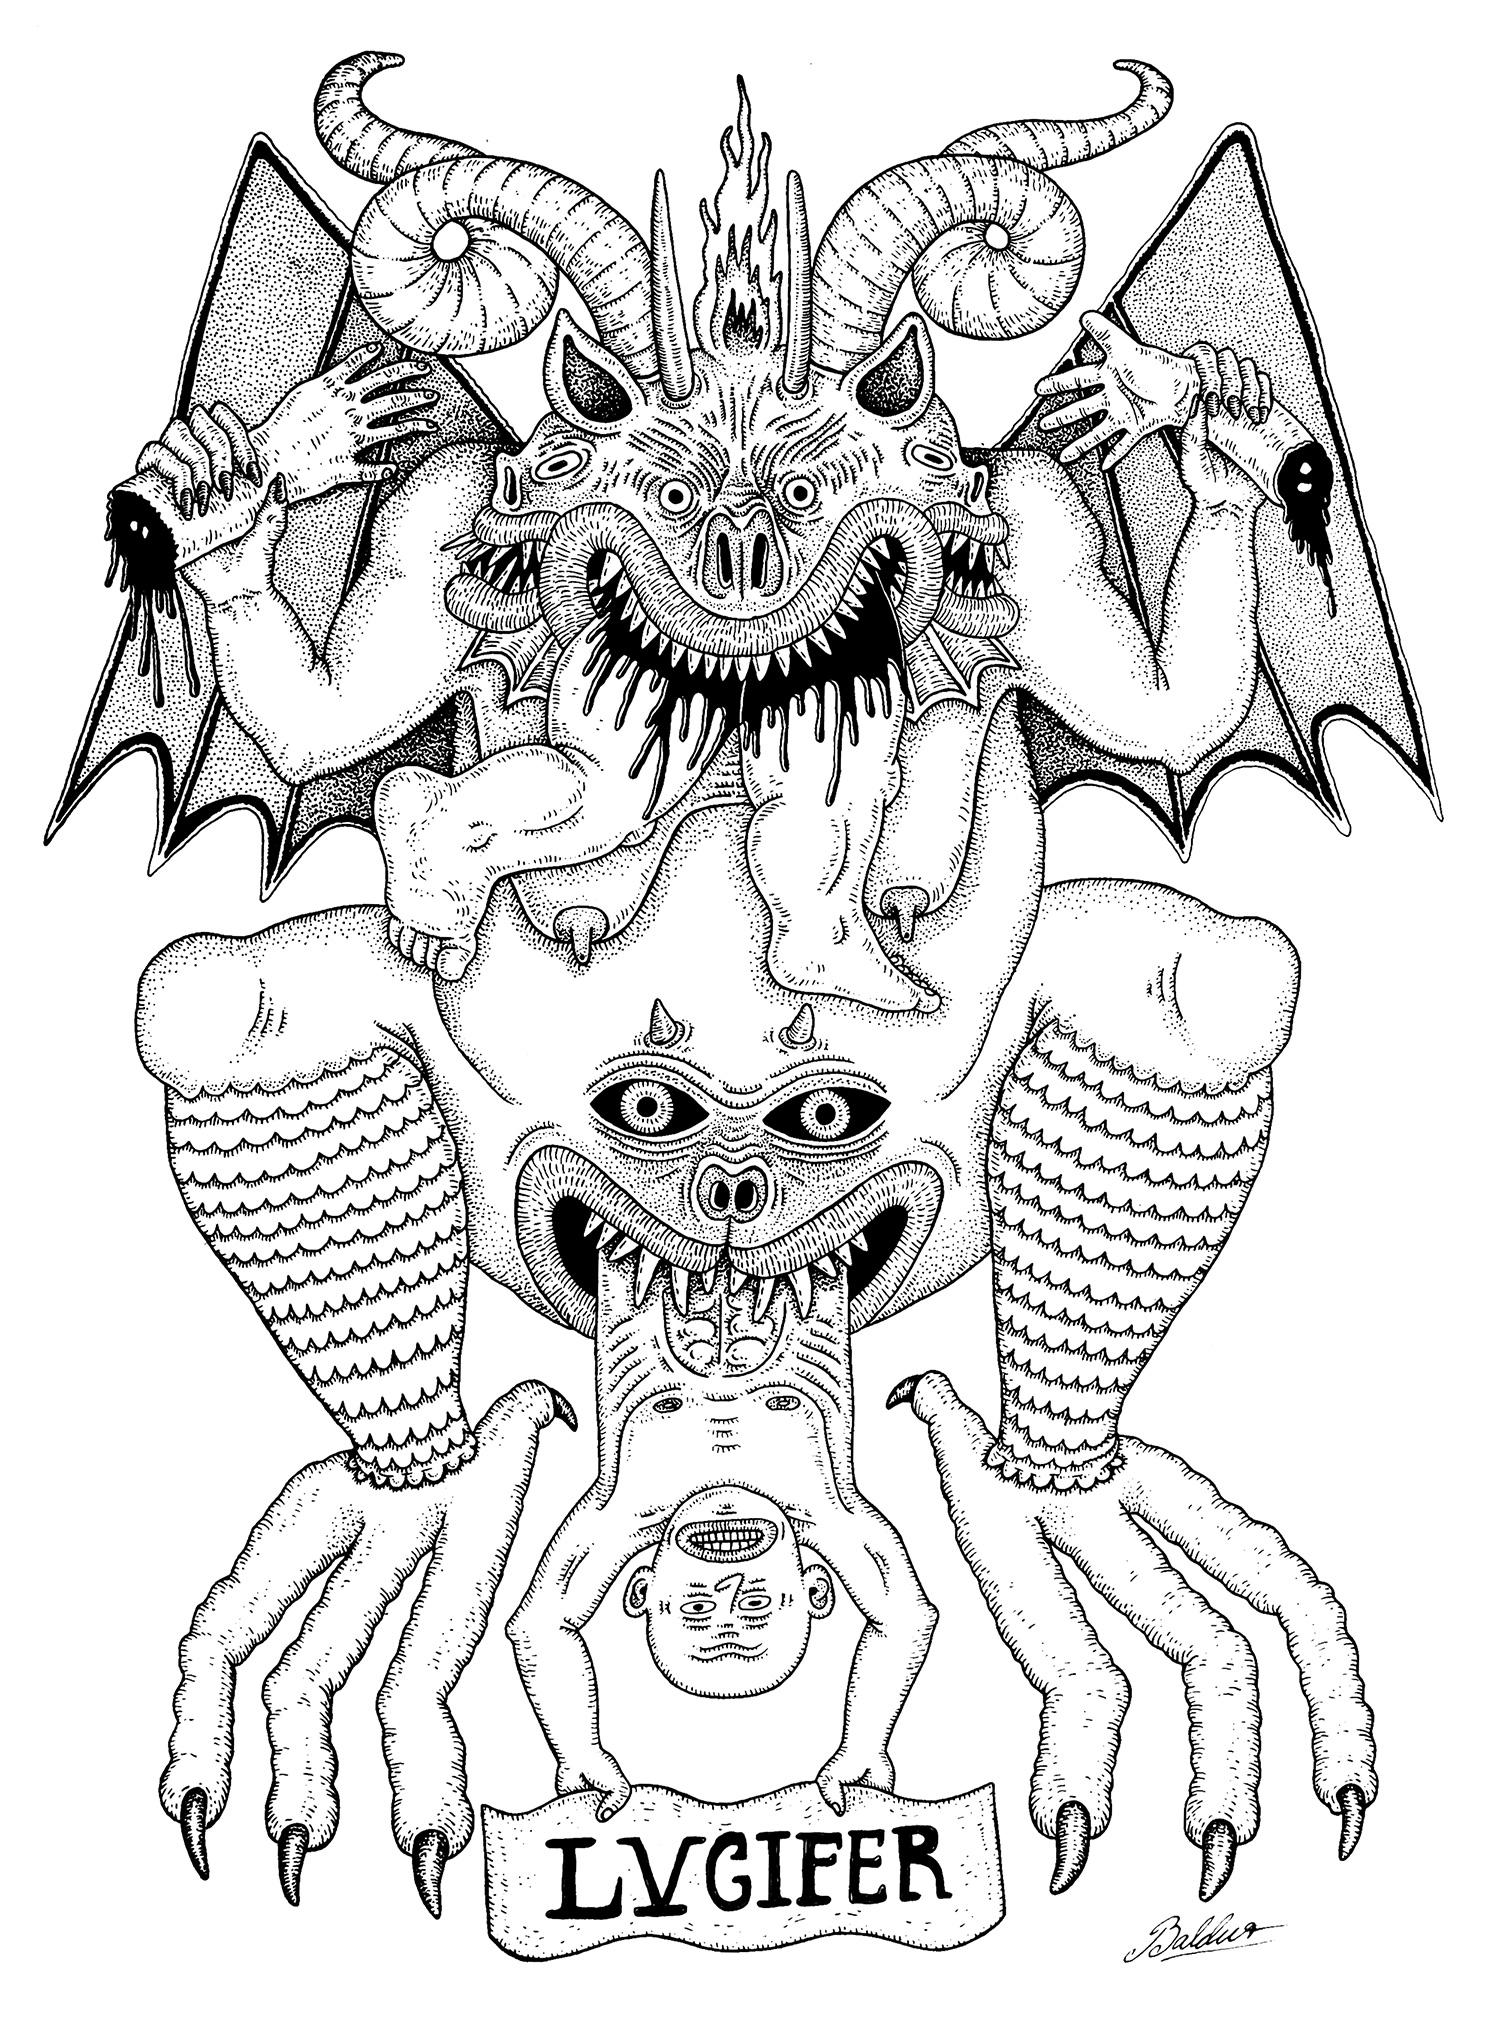 Lvucifer  Pen & Ink on Paper, 14x17 2016